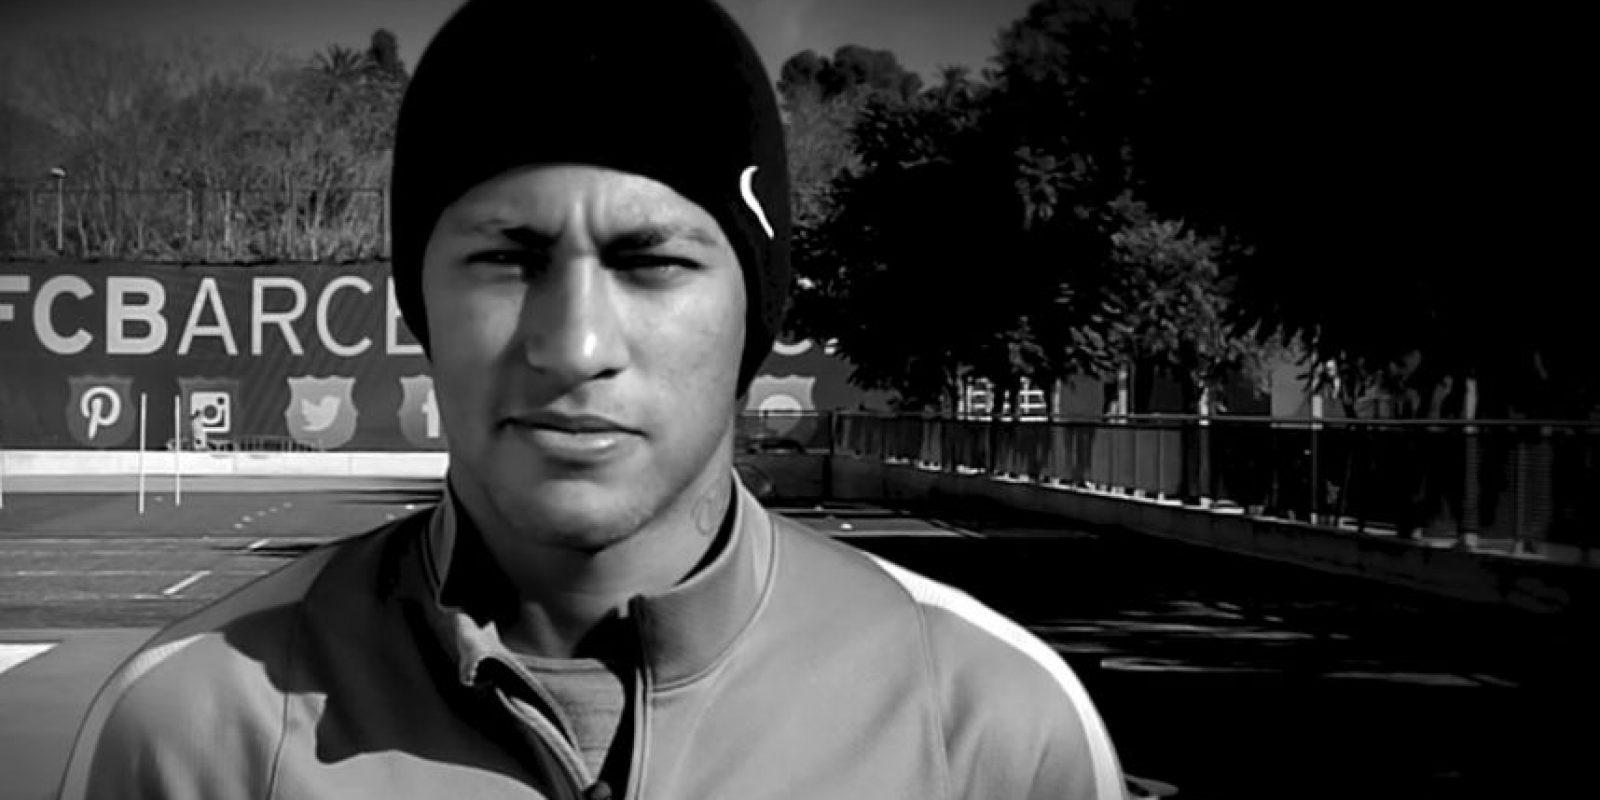 Neymar, futbolista brasileño del Barcelona. Foto:vía PSG – Paris Saint-Germain / YouTube